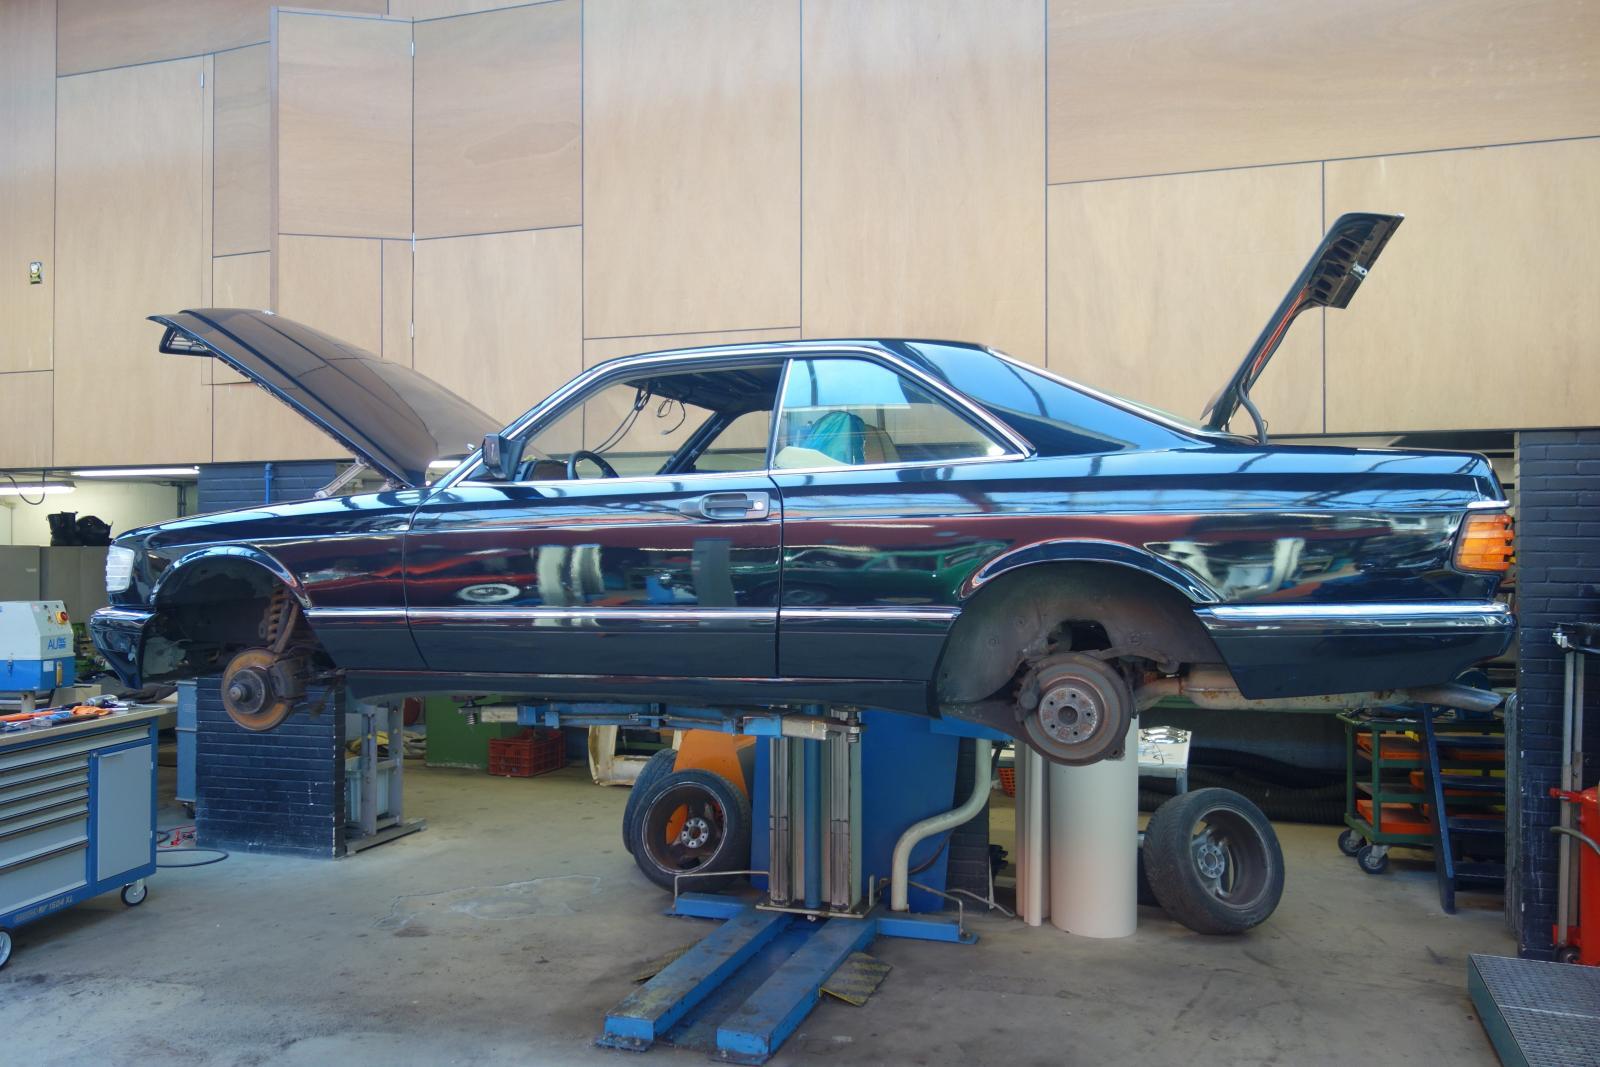 mercedes benz 500 sec oldtimer restoration company bart holland mercedes benz 500 sec oldtimer